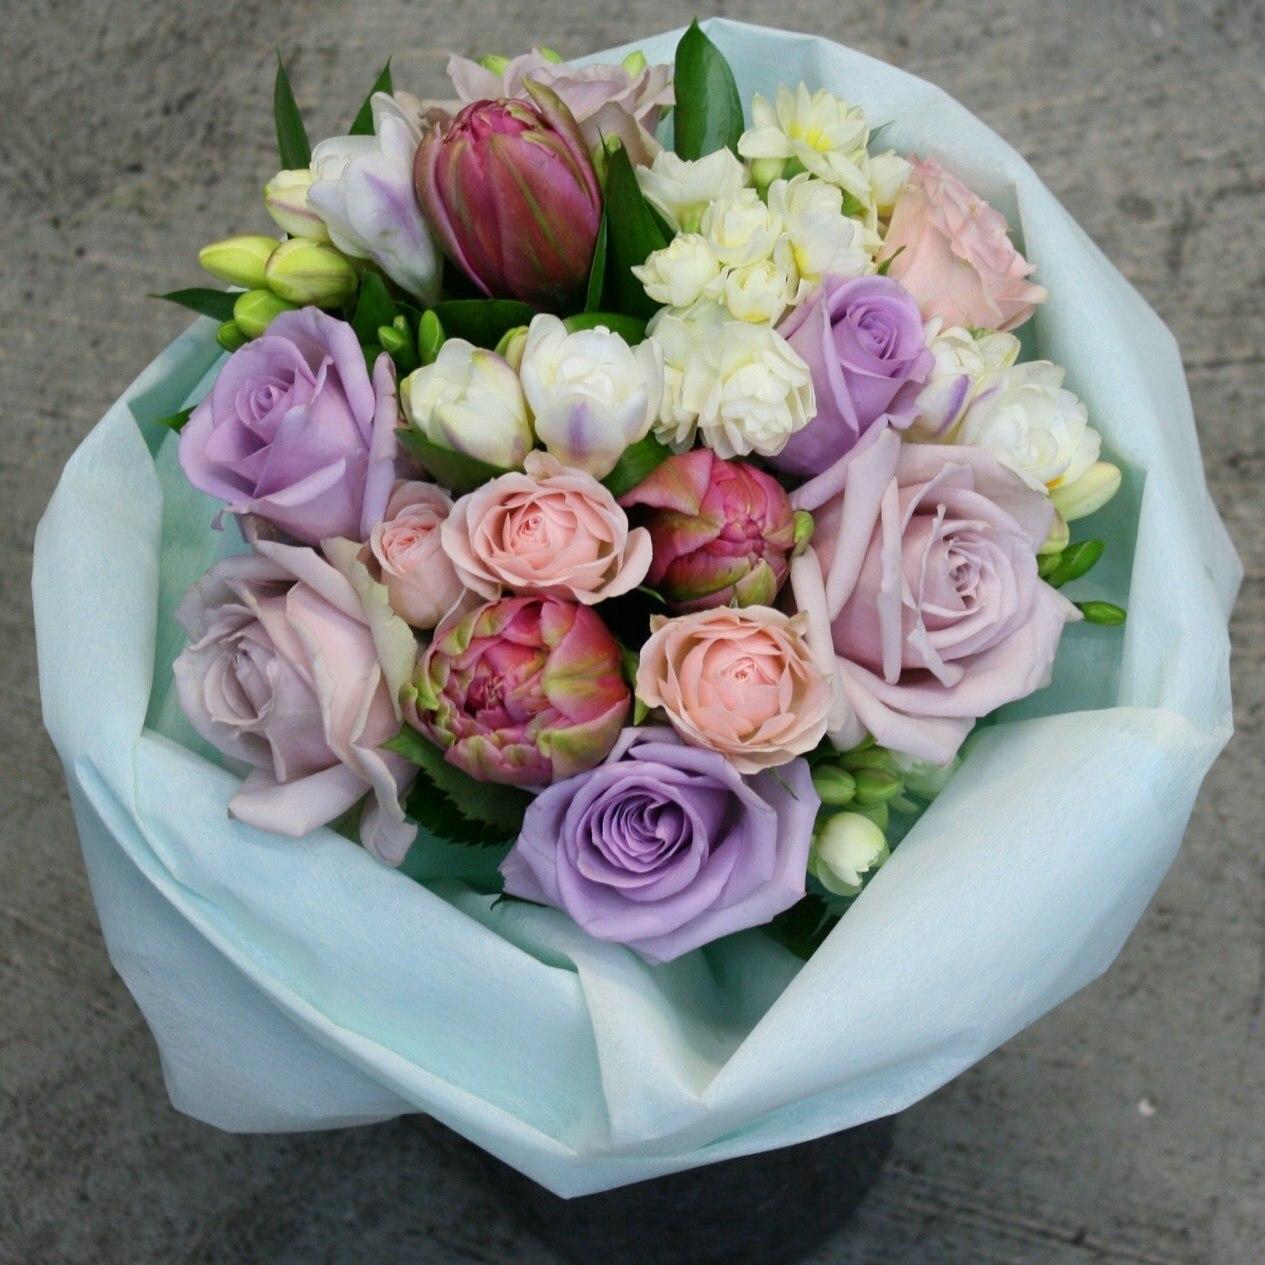 Pastel tones in a handtied bouquet.